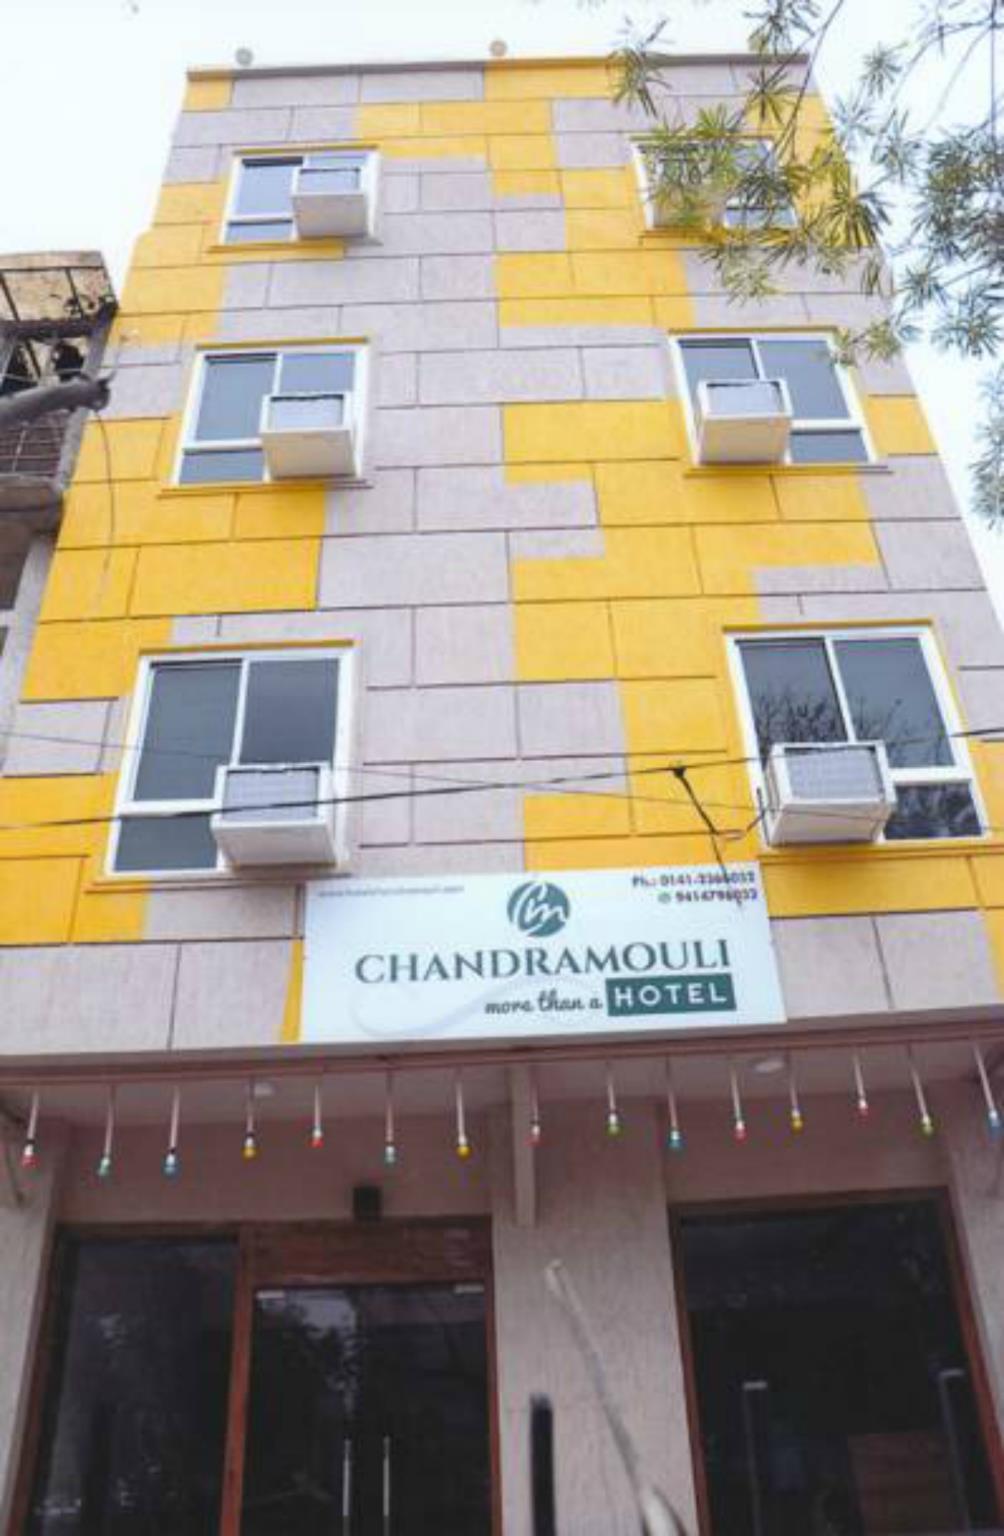 Hotel Chandramouli